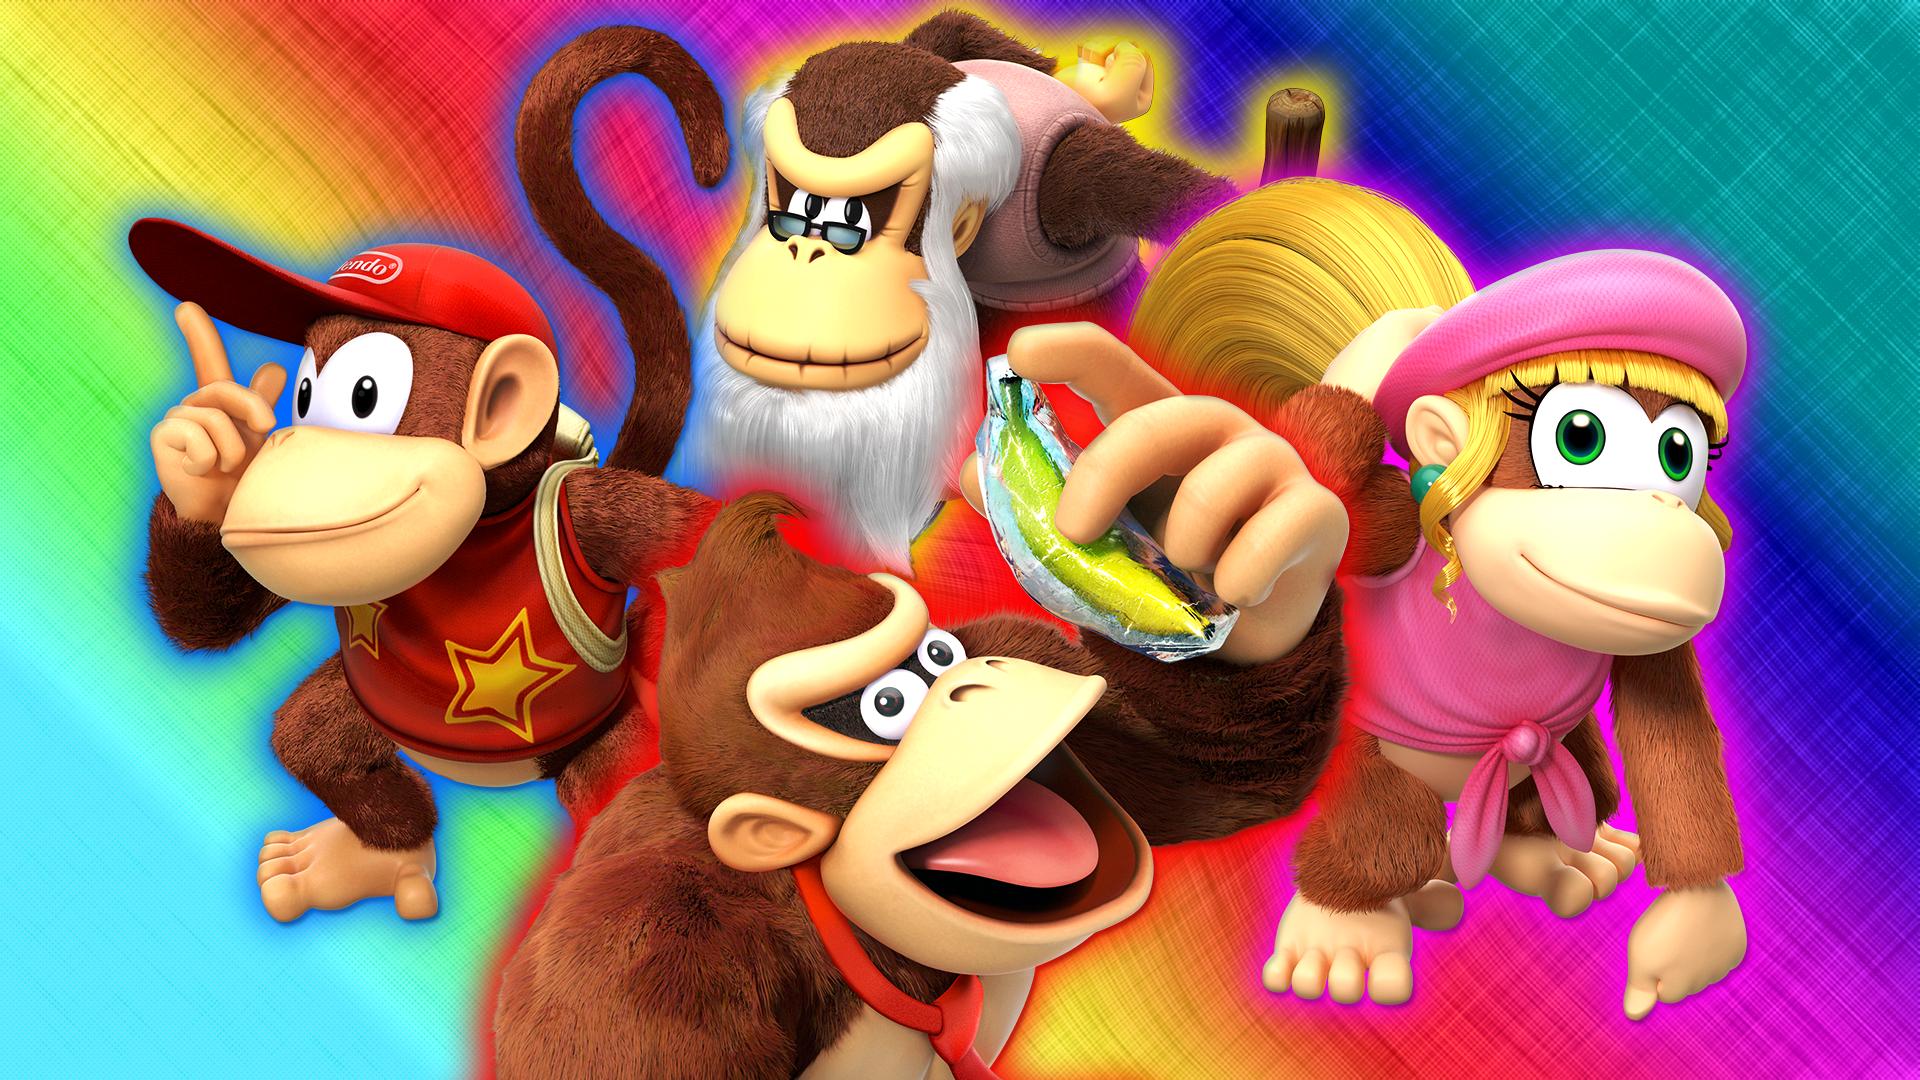 Donkey-Kong-Computer-Desktop-Backgrounds-x-wallpaper-wp3804611